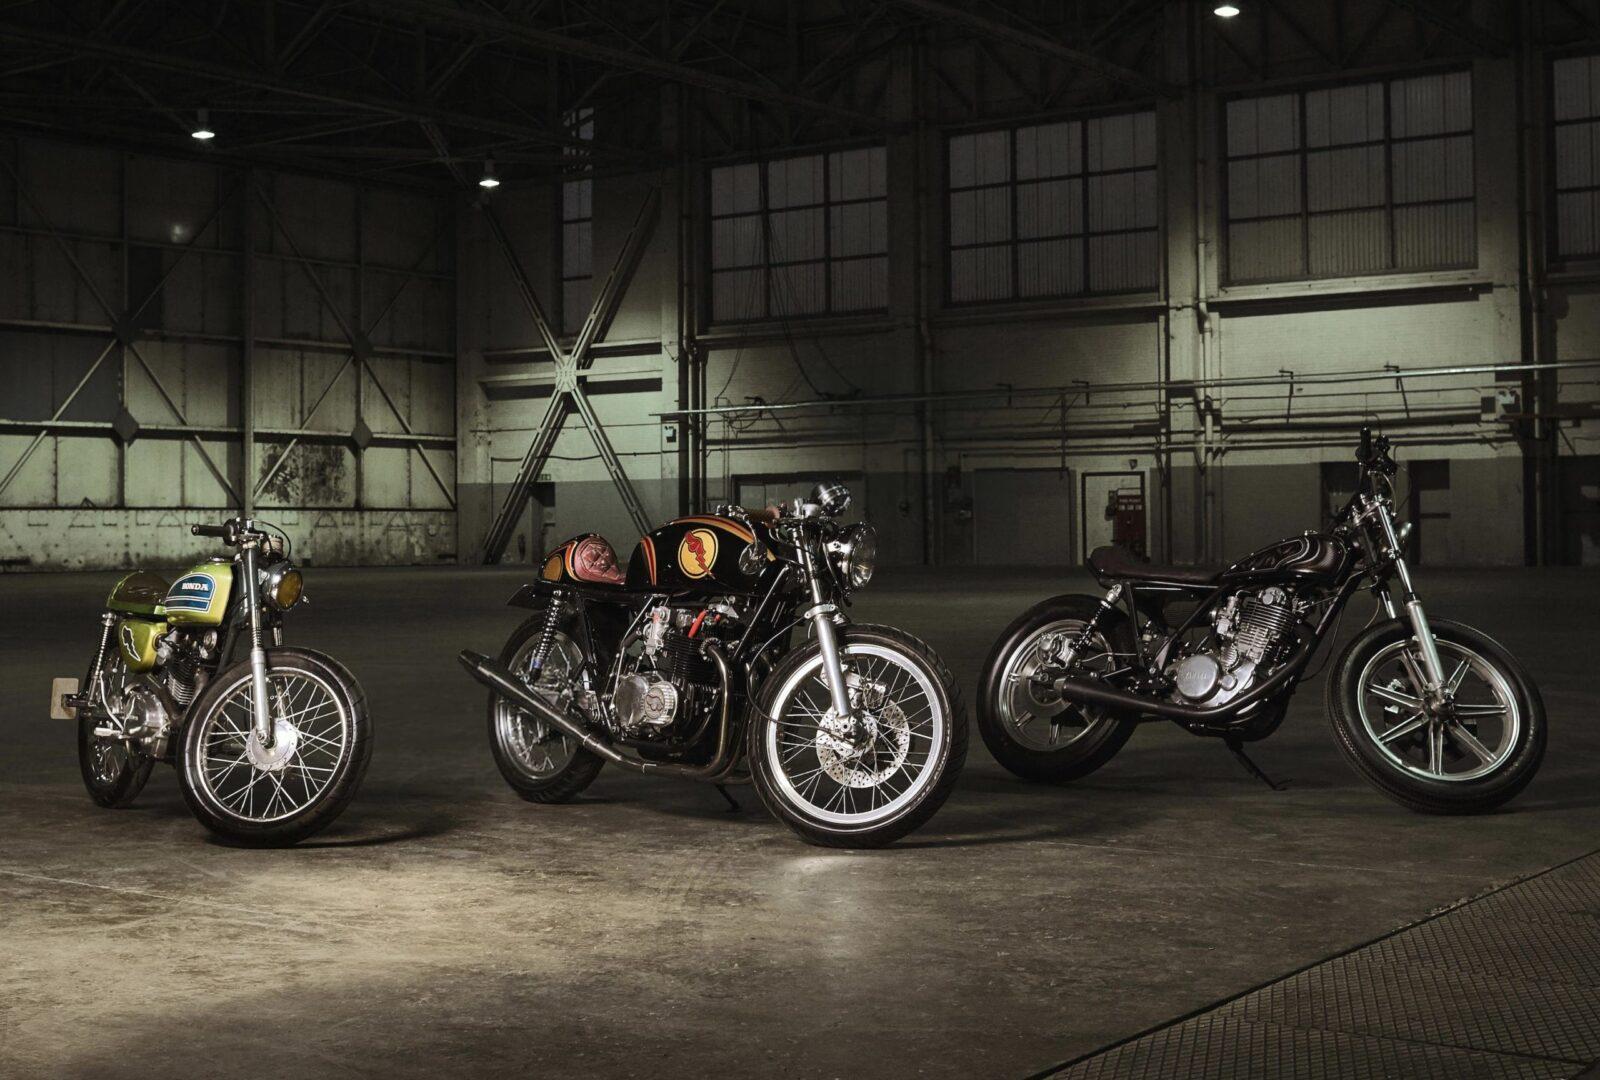 D*Face Custom Motorcycles